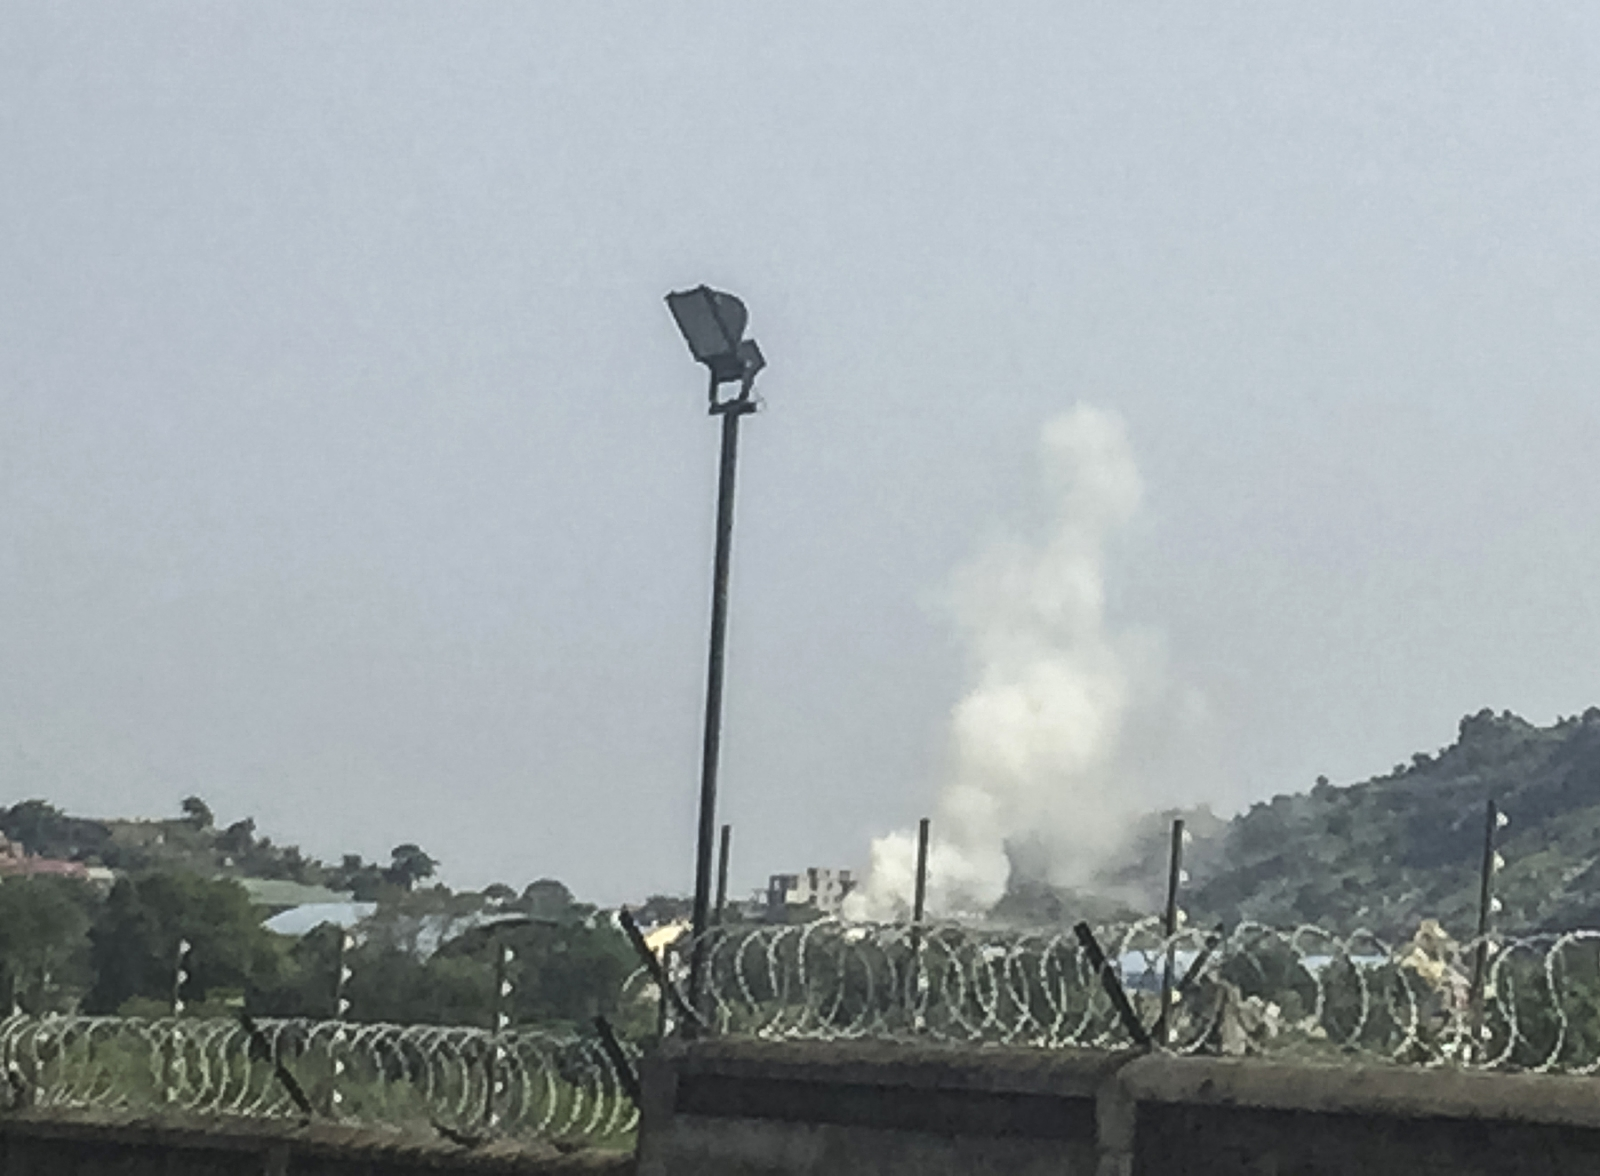 Clashes in the capital Juba, South Sudan